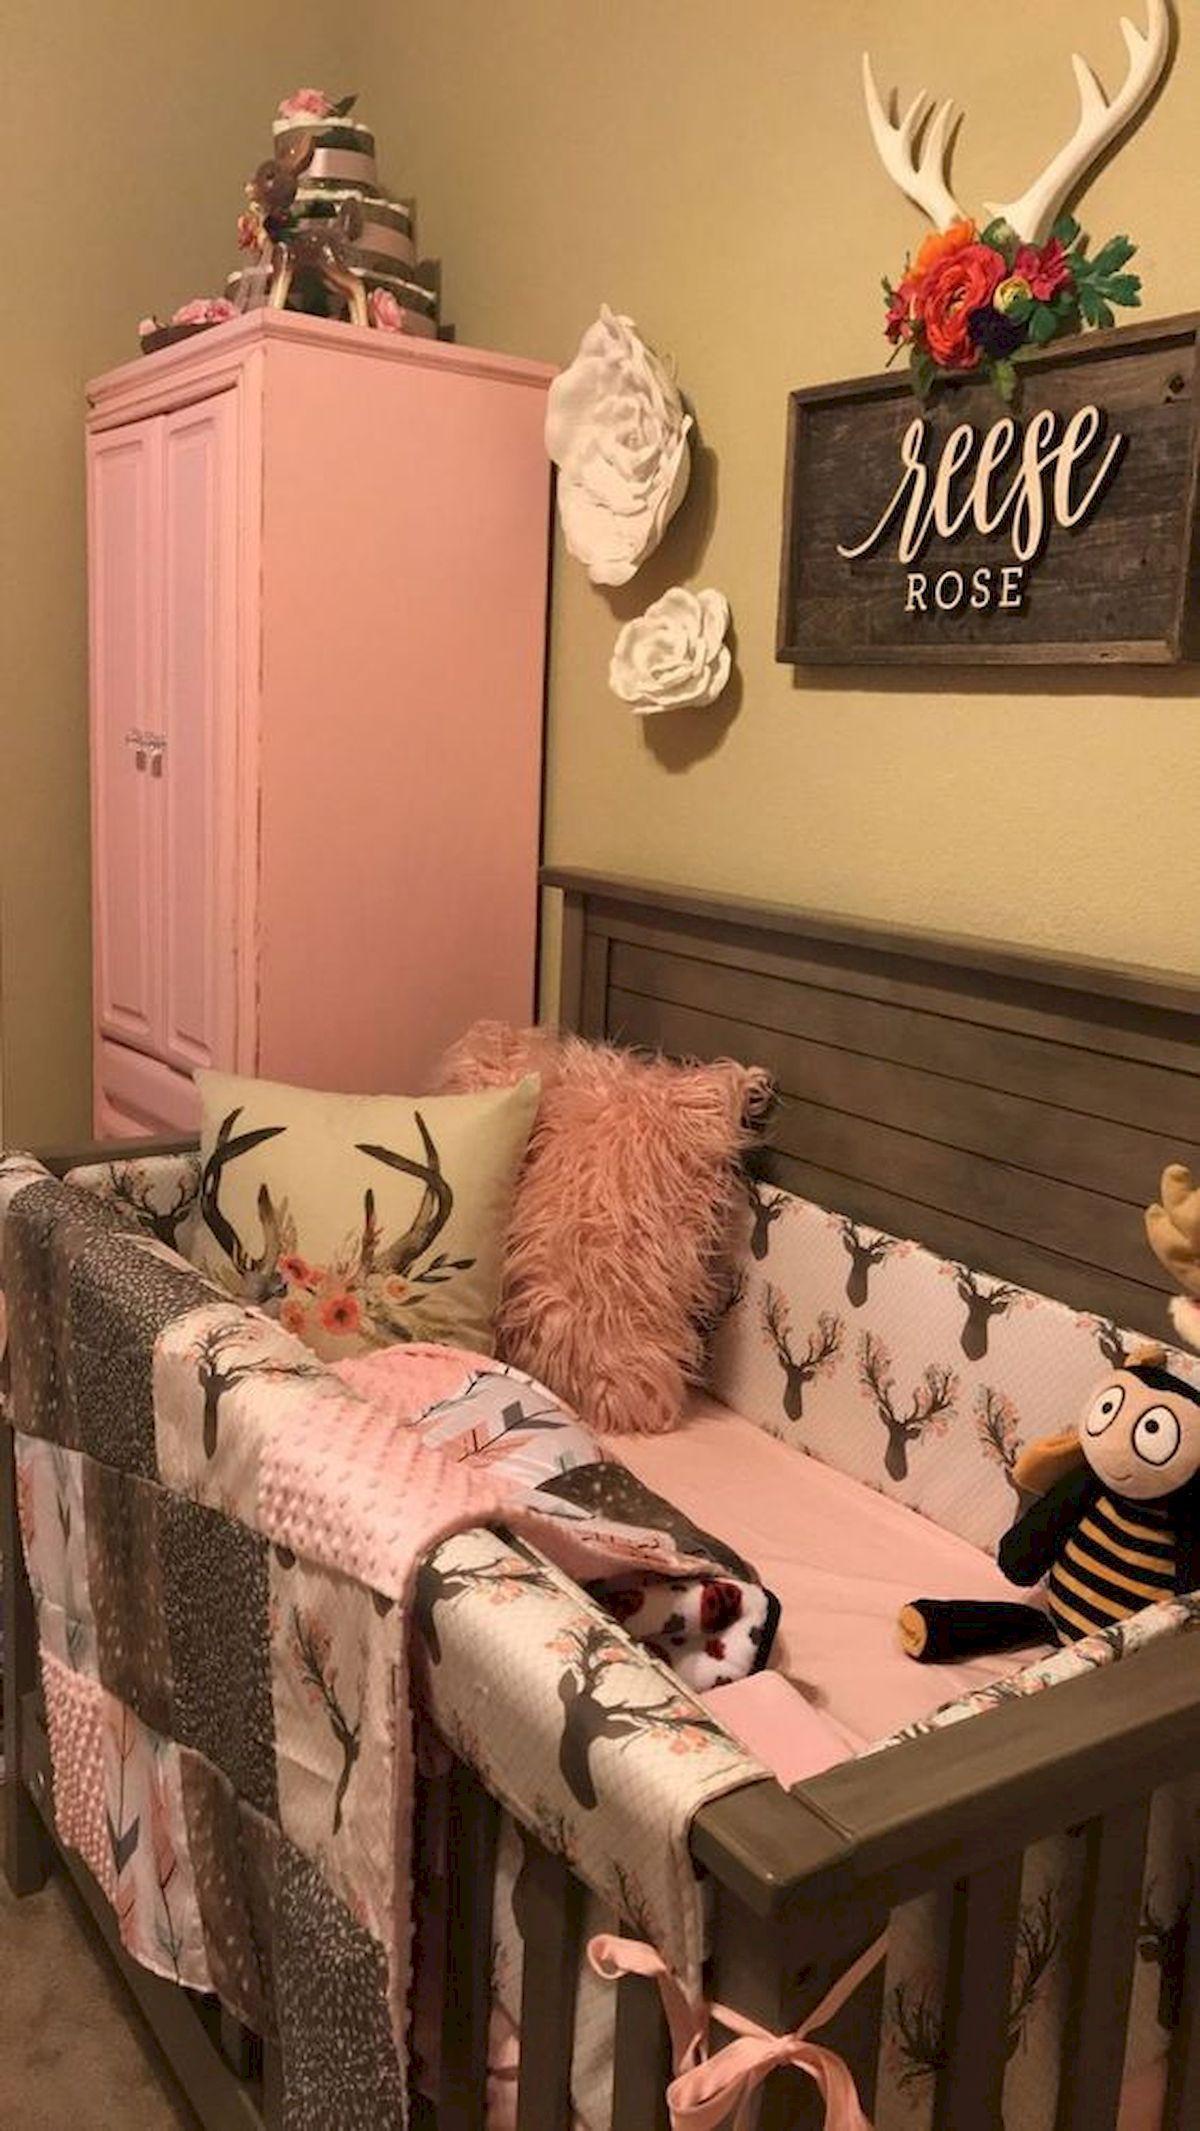 30 Adorable Rustic Nursery Room Ideas (22 images